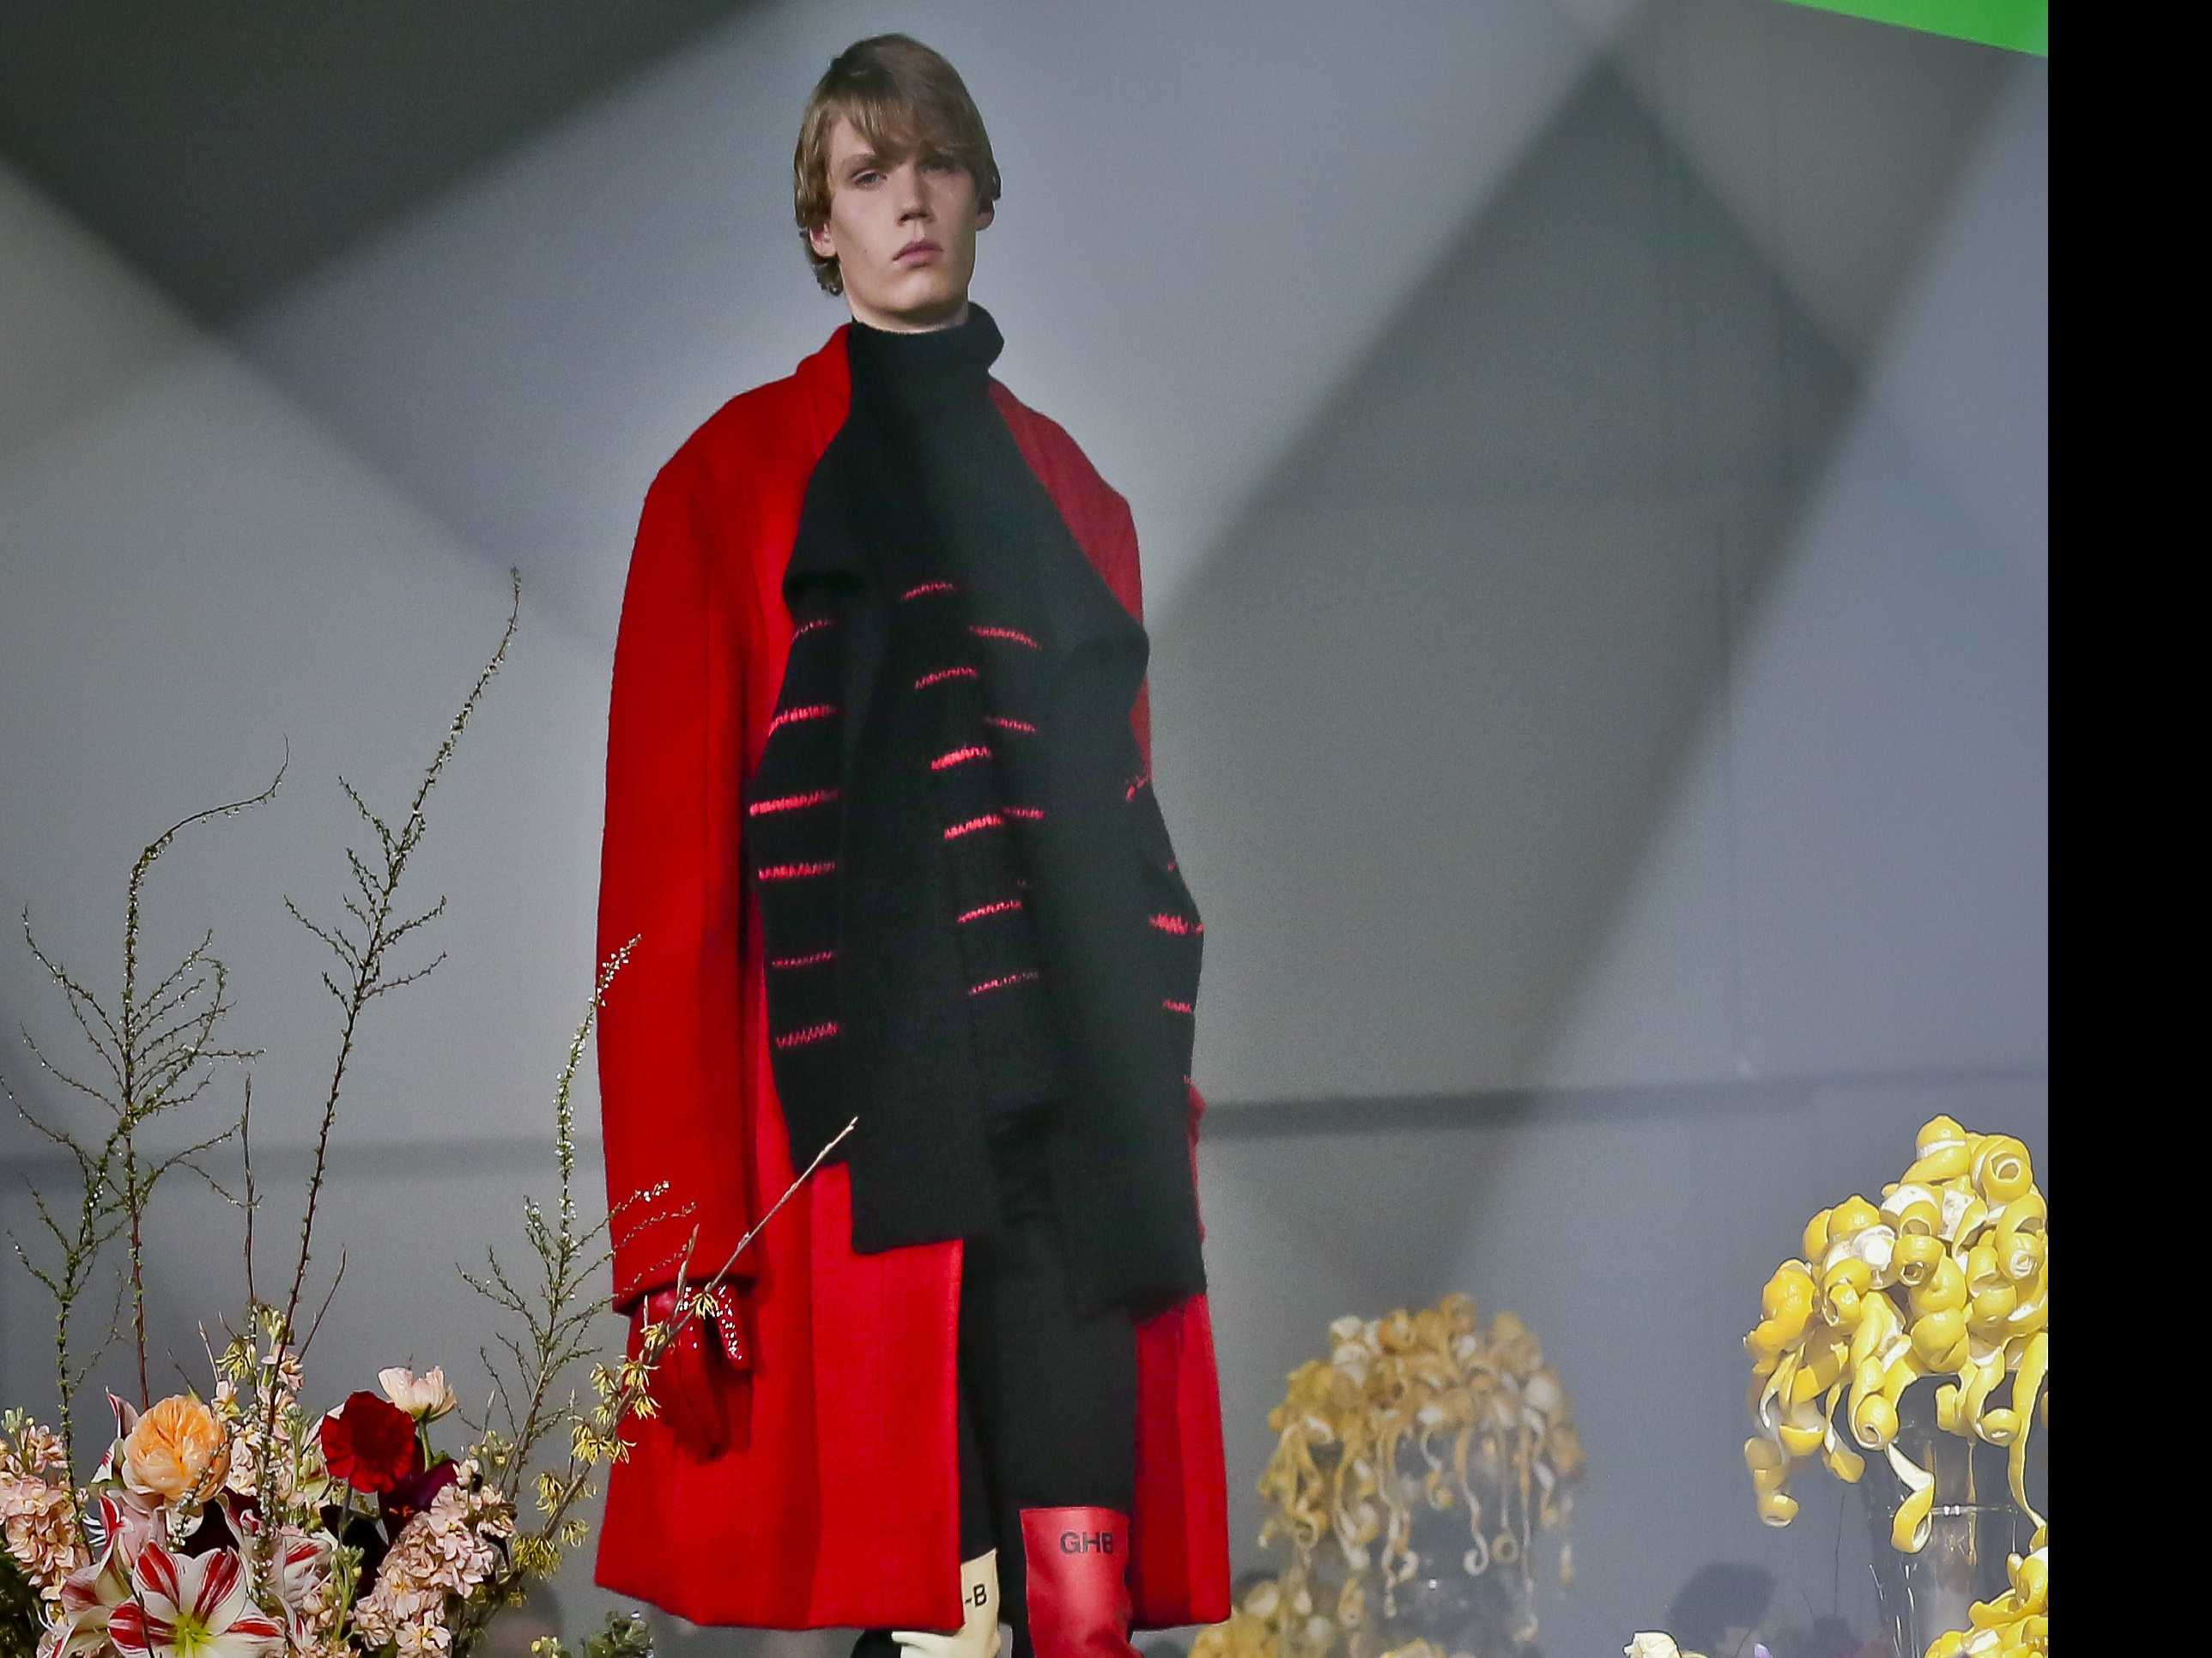 NY Fashion Week Recap: Raf Simons and Boss